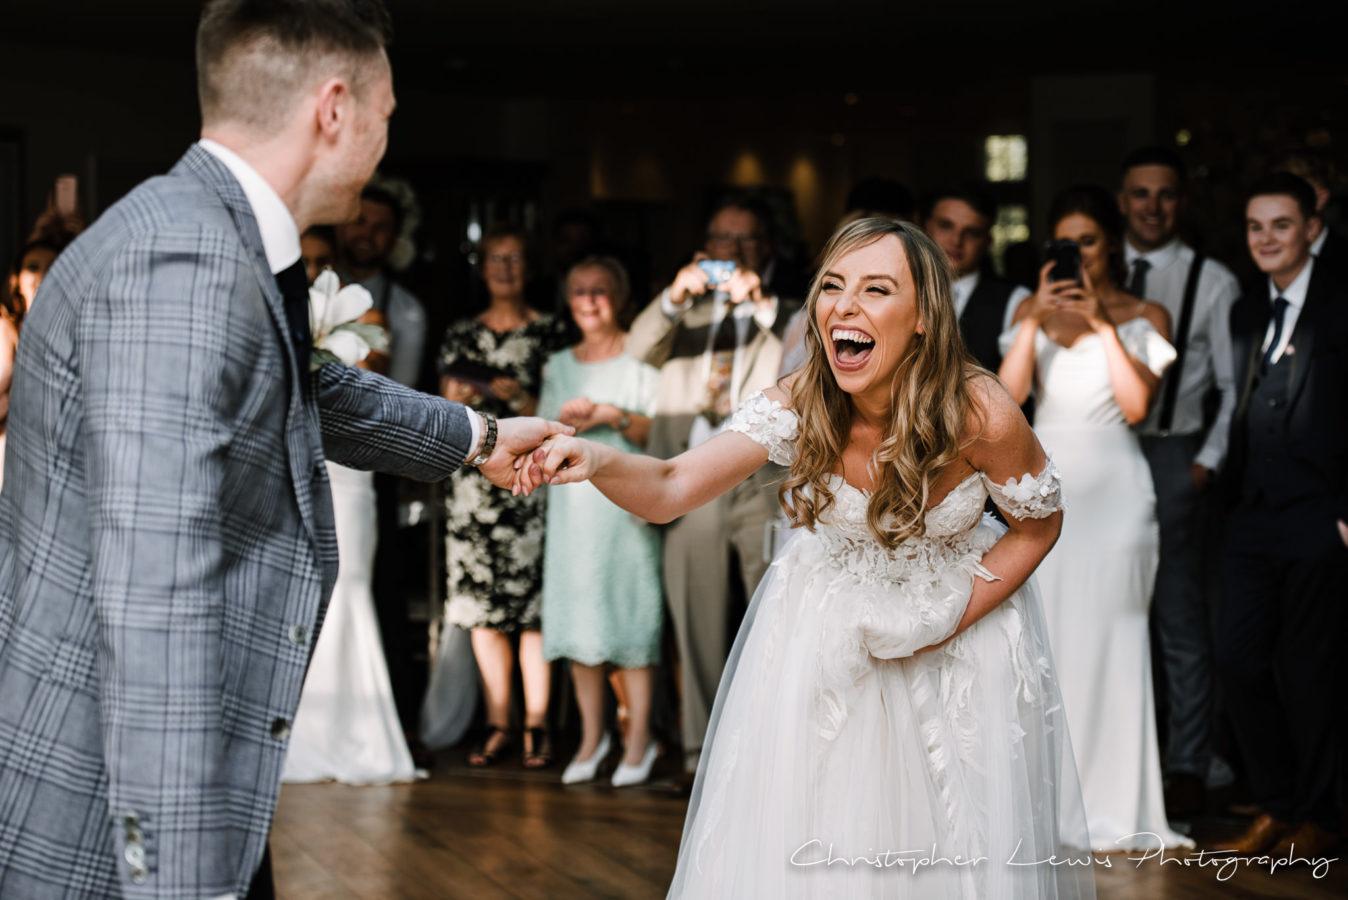 Mitton-Hall-Wedding 74